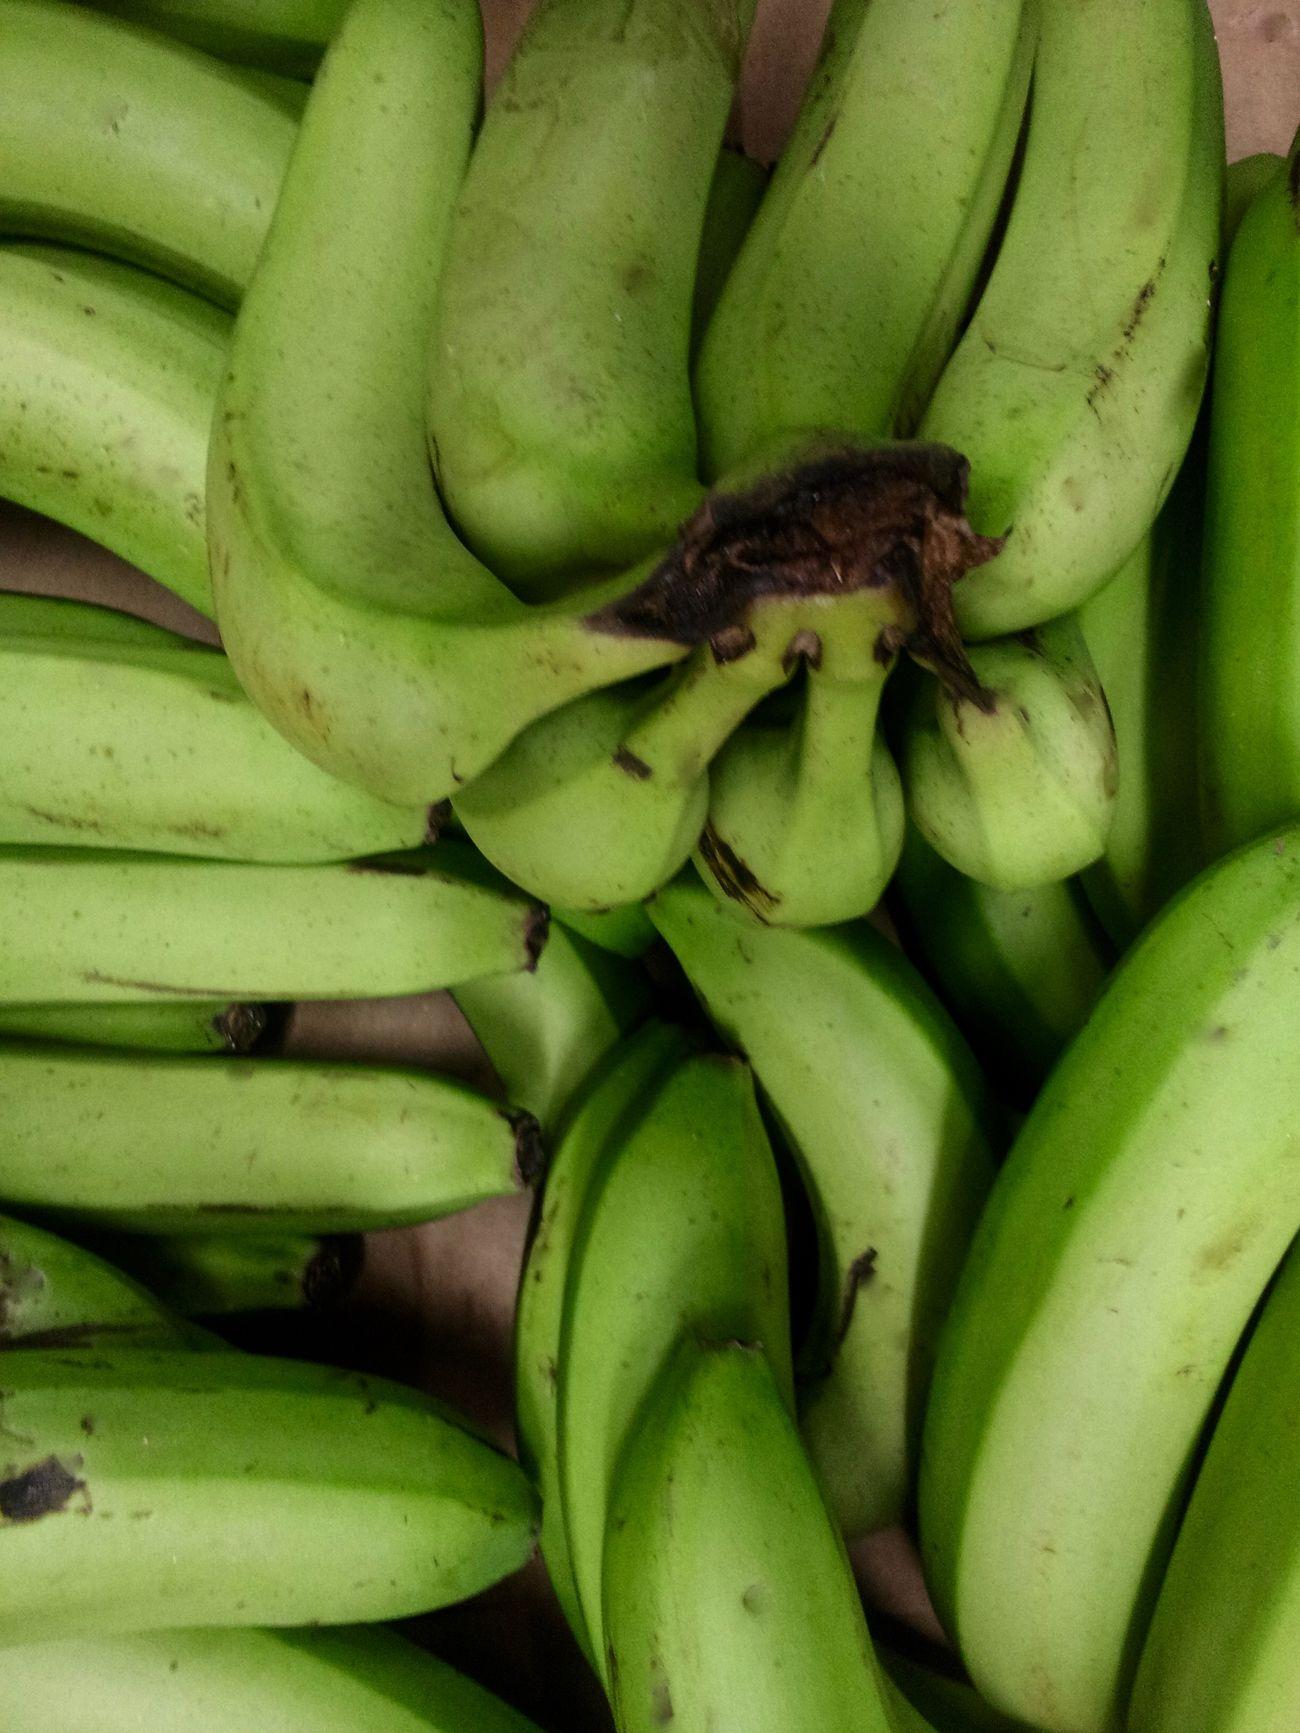 Abundance Bananas Choice Close-up Composition Food Fruits Full Frame Green Green Bananas Green Color Indian Shop, Passage Brady, Paris Market Stall Organic Soon !! ( I Hope ! ;)) Still Life Vegetables And Fruits